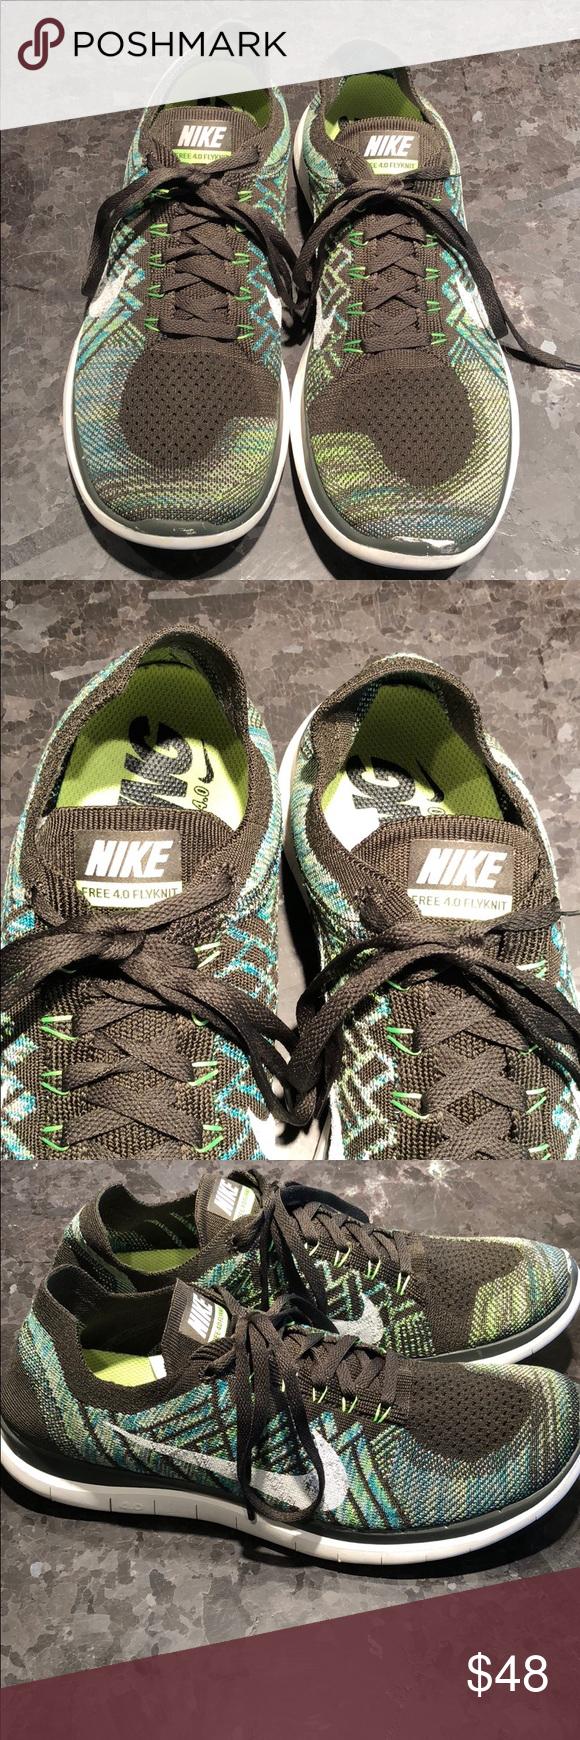 Nike Barefoot Ride Flyknit 4.0. Running